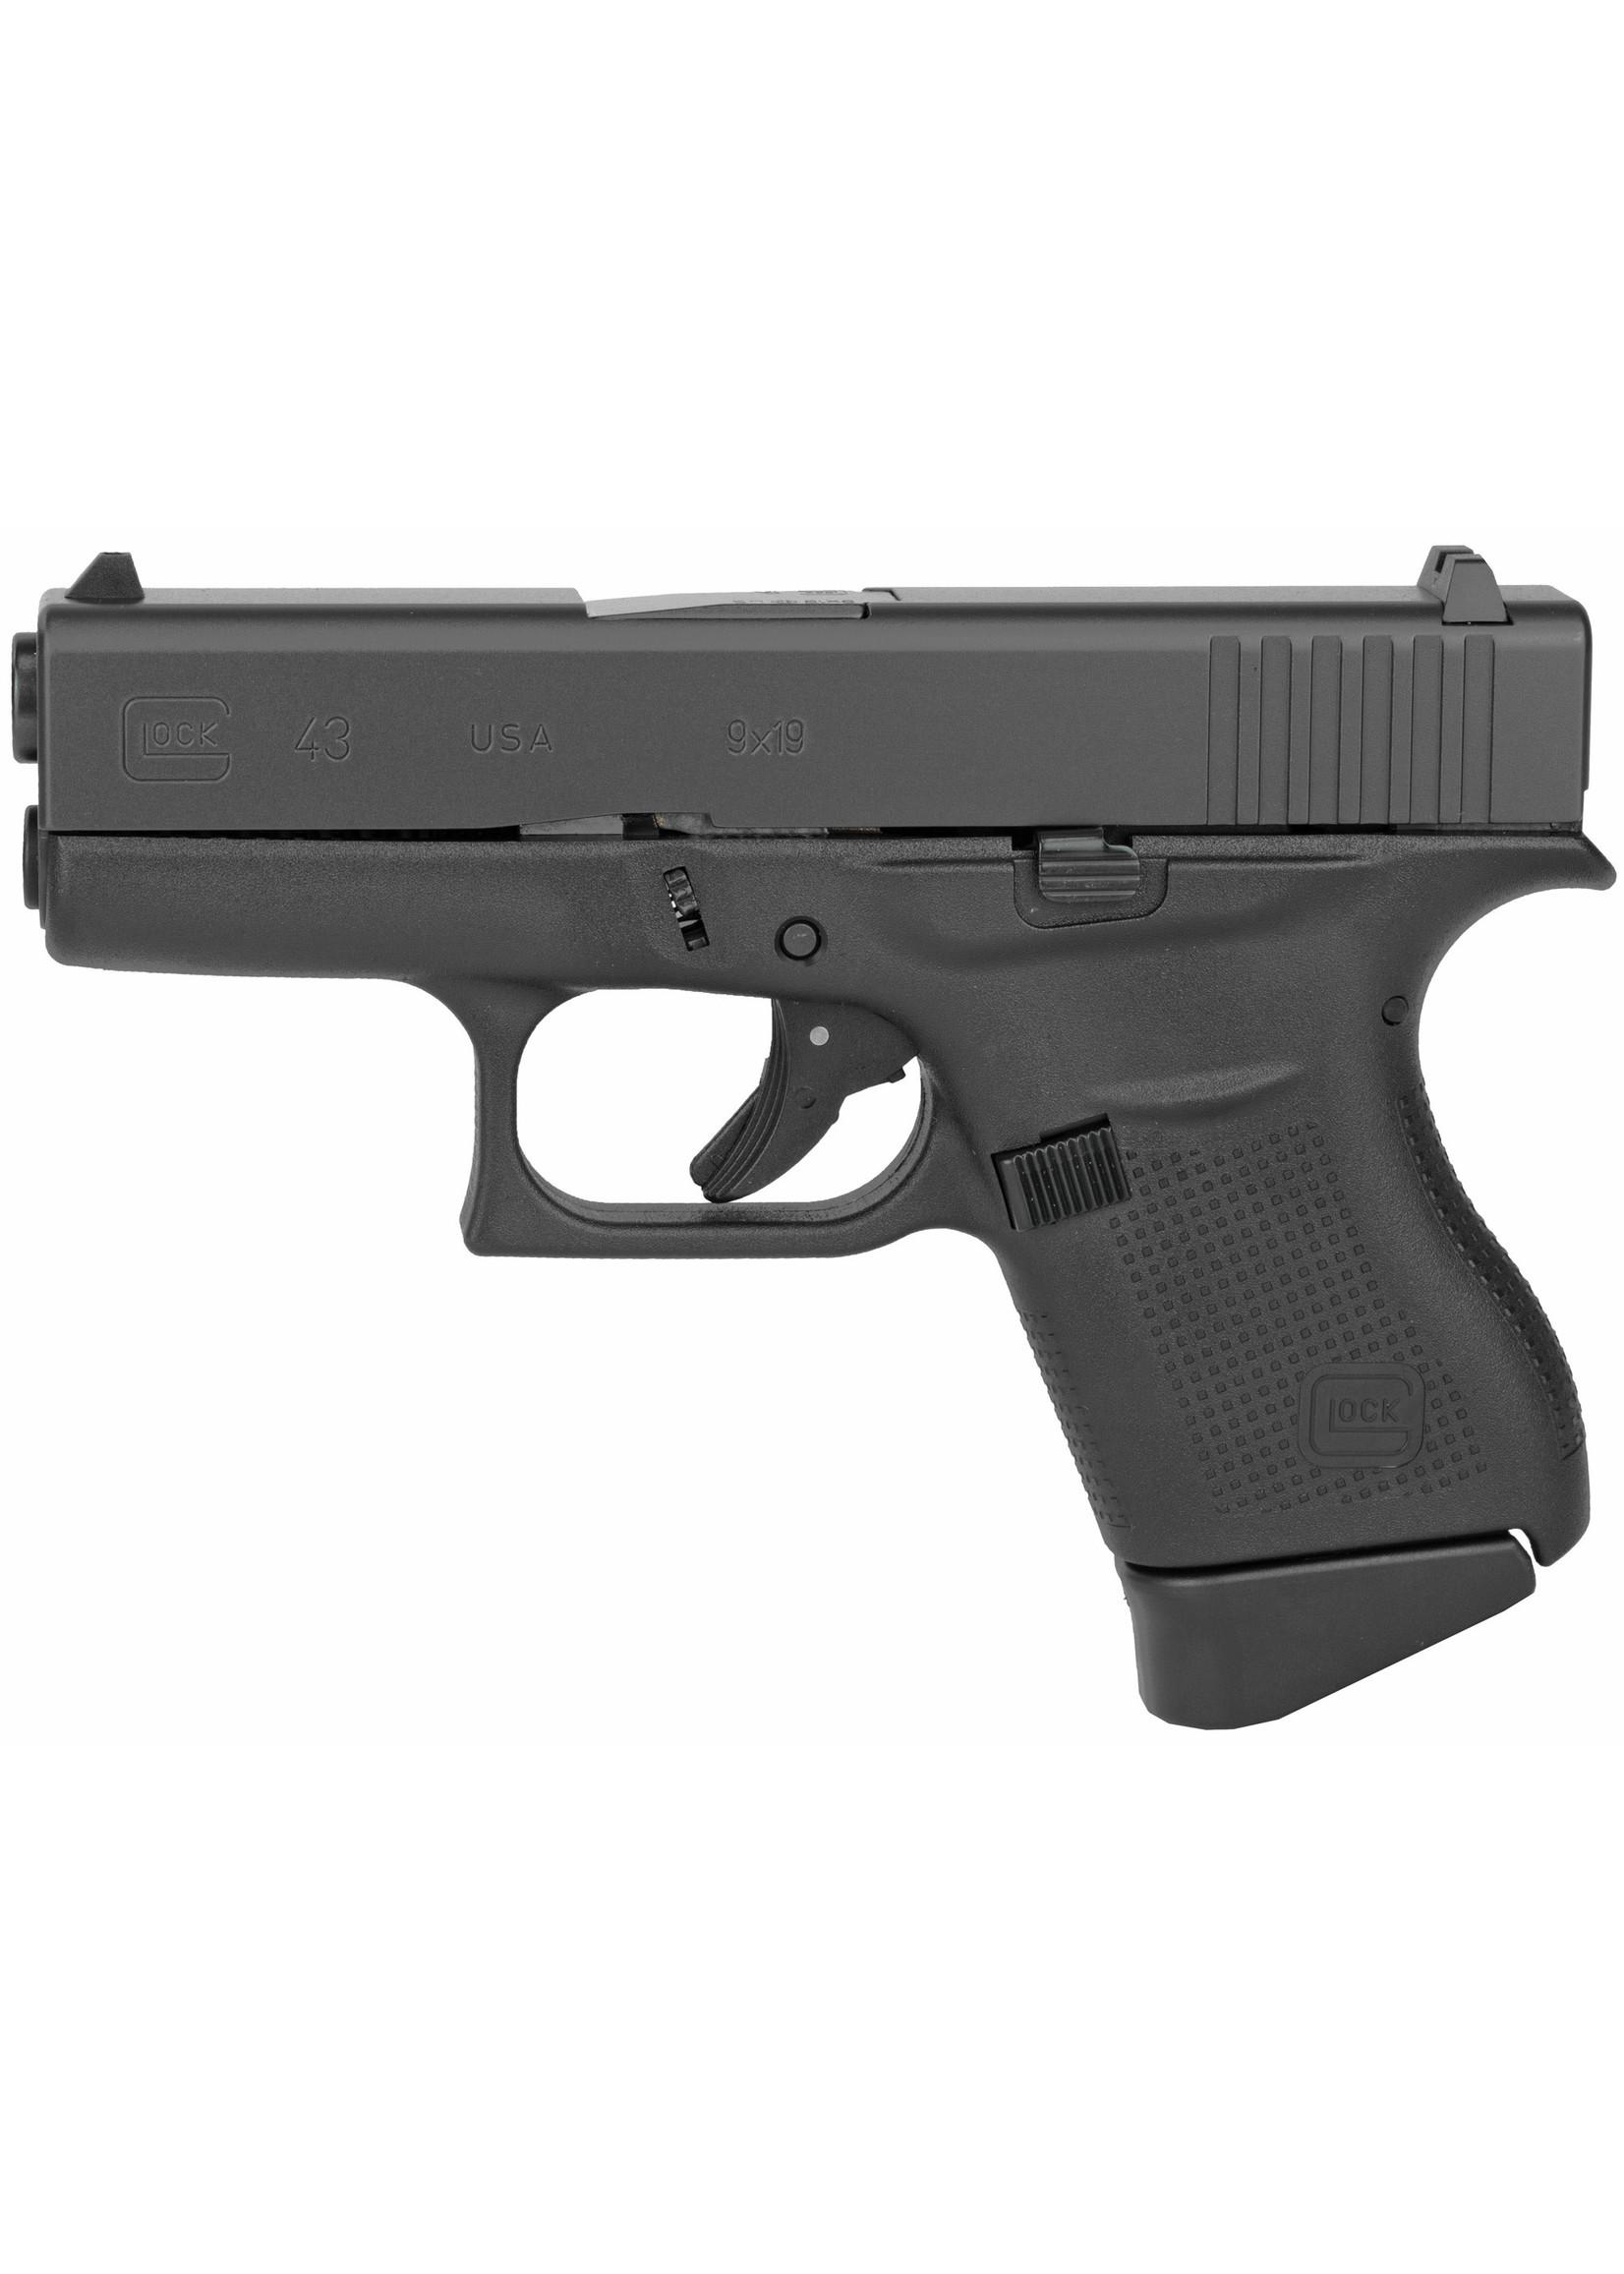 "Glock Glock 43, 9MM, 3.41"" Barrel, Polymer Frame, Matte Finish, Fixed Sights, 6Rd, 2 Magazines"